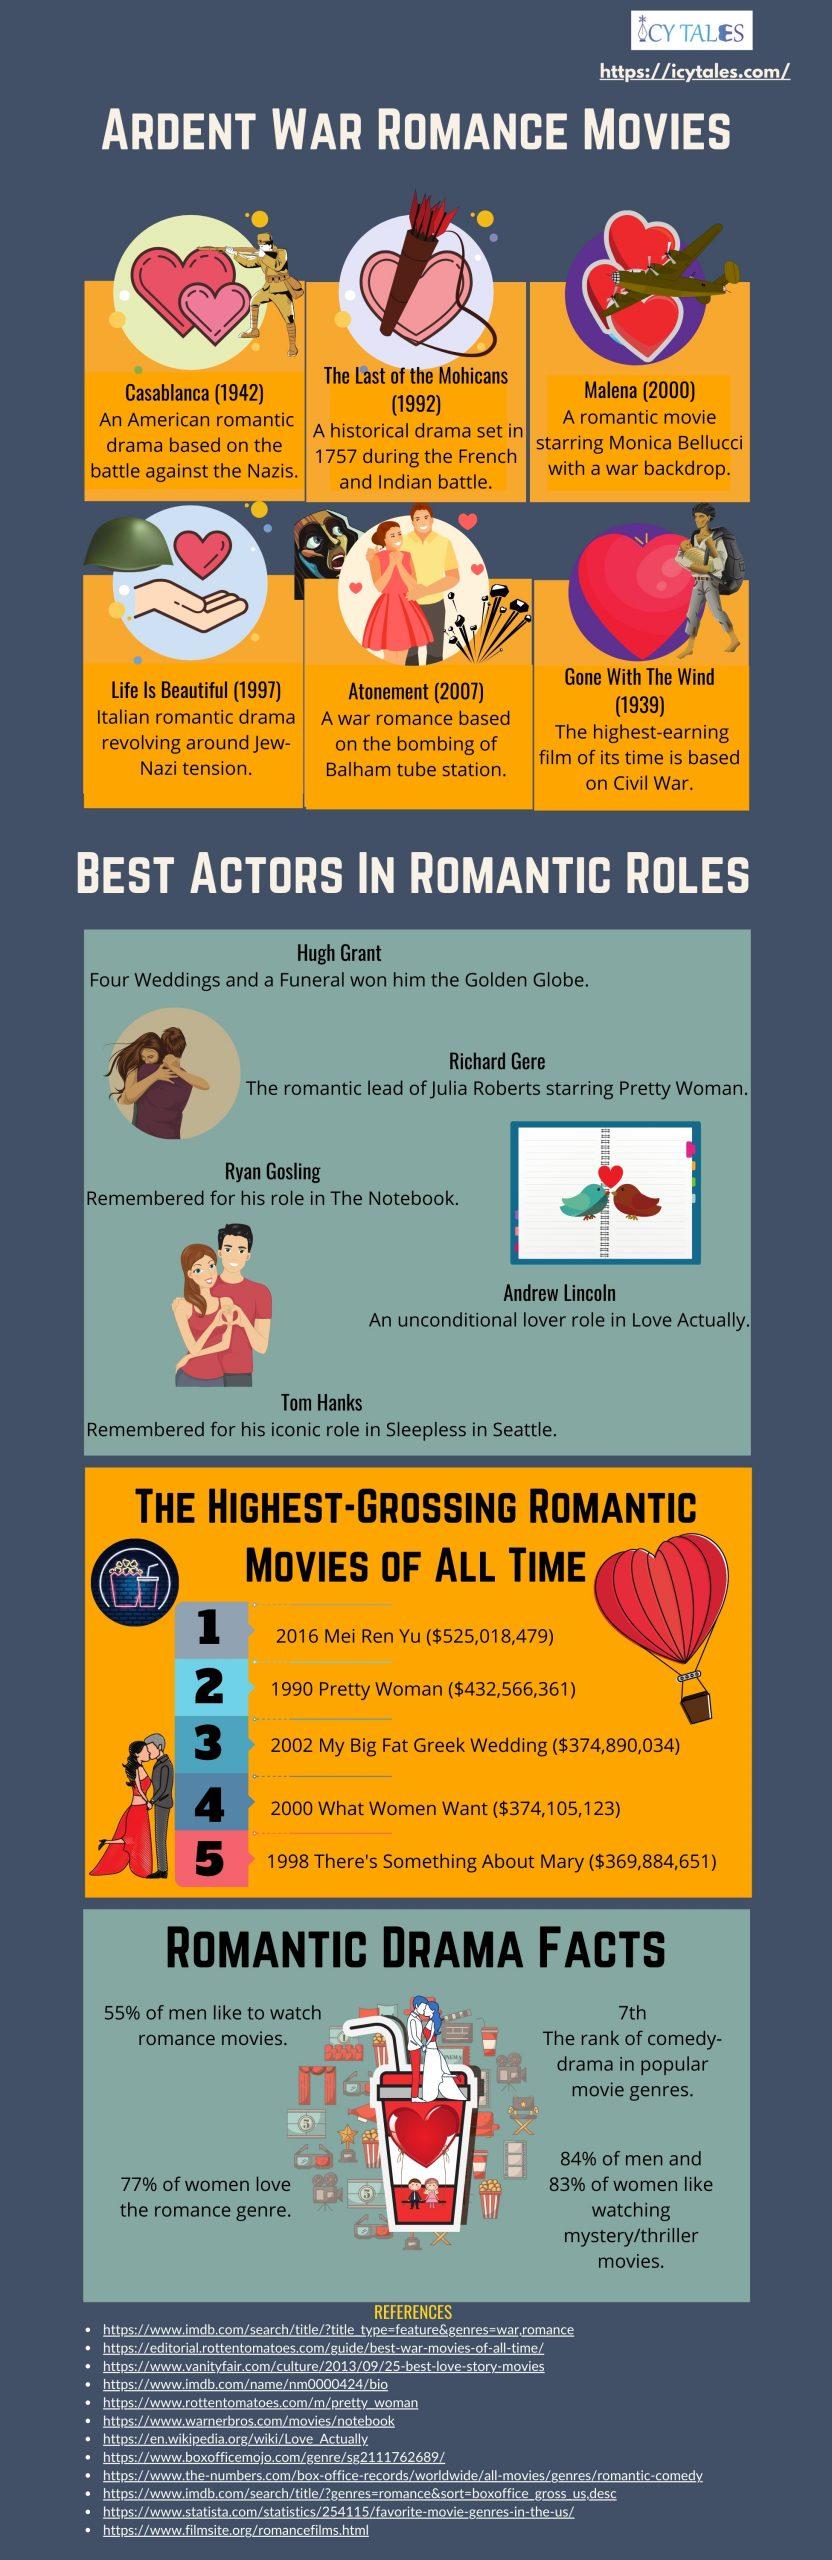 Ardent War Romance Movies